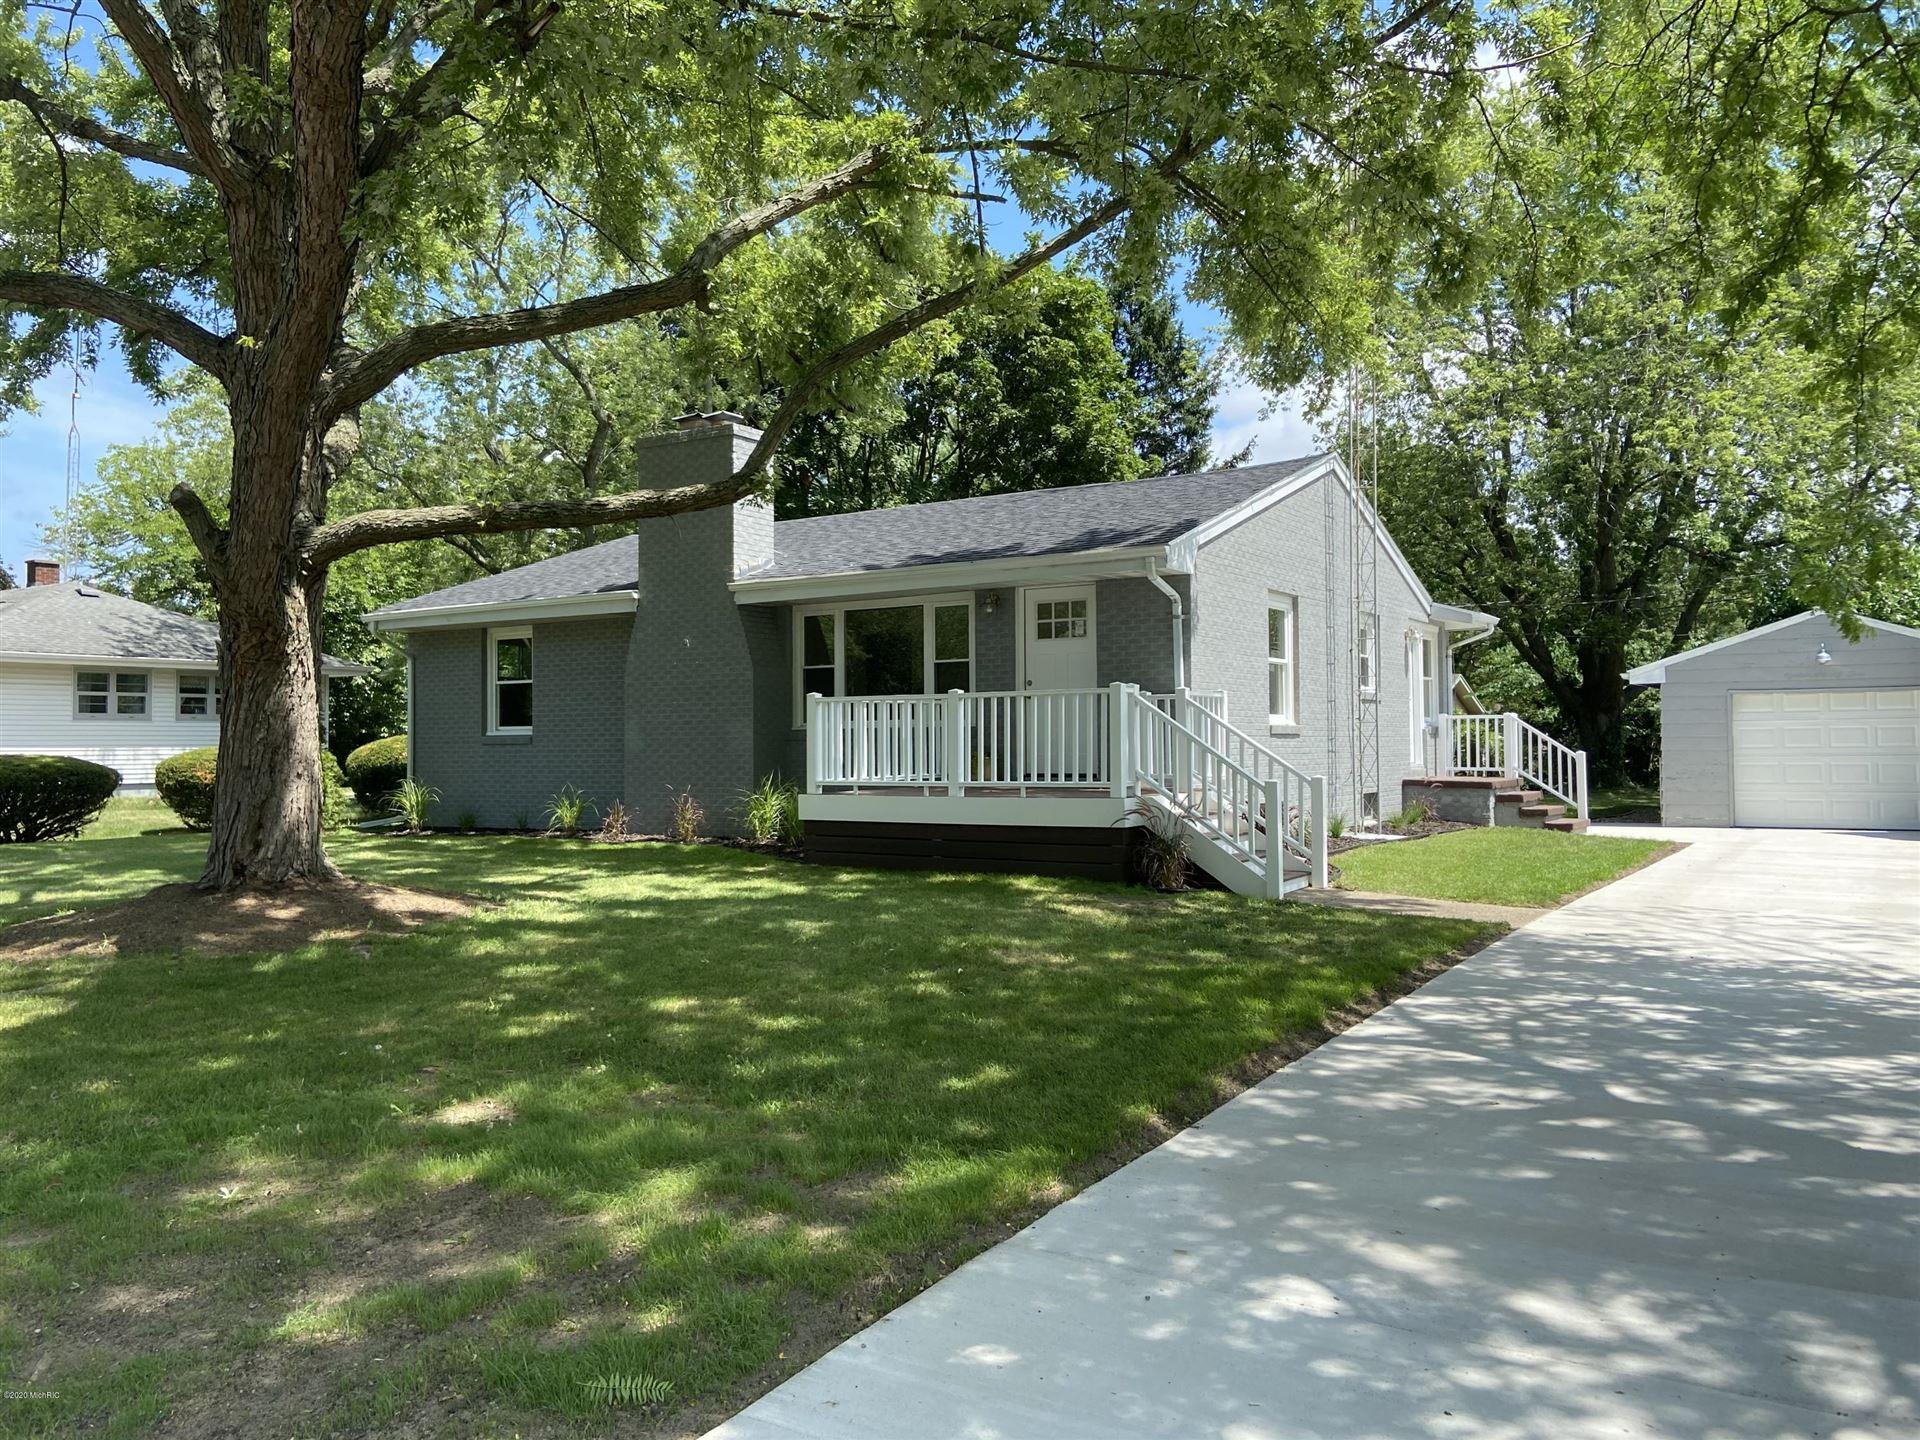 1873 Smyers Drive, Benton Harbor, MI 49022 - MLS#: 20028990